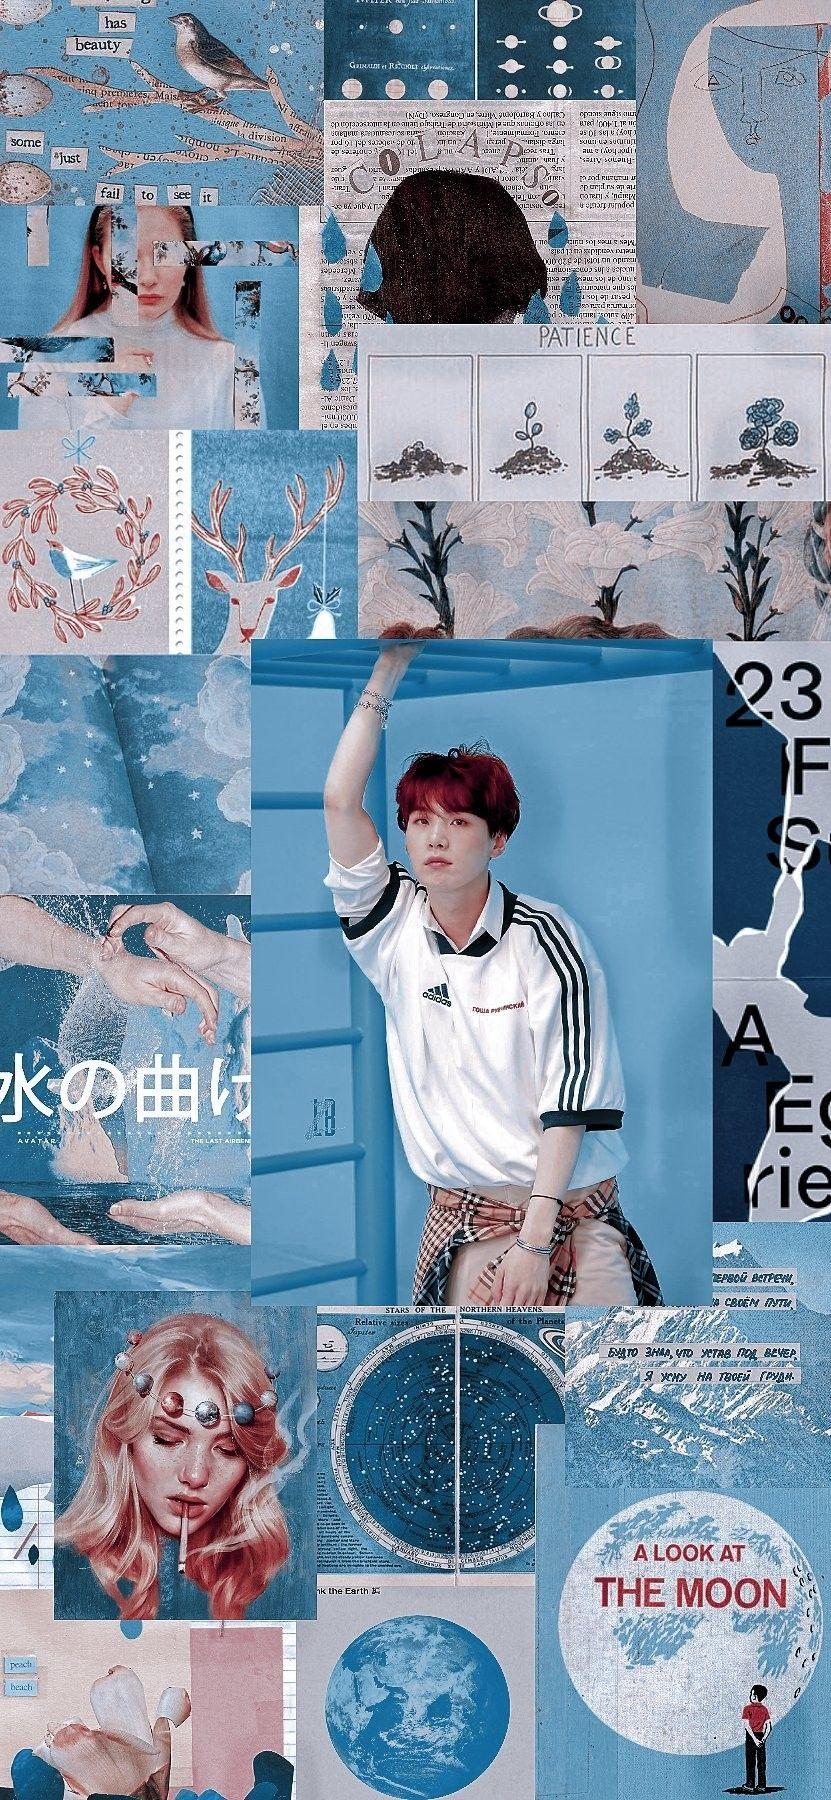 Bts Wallpaper Suga Lockscreen Background Blue Bts Suga Yoongi Bts Wallpaper Suga Lockscreen Backgroun Bts Wallpaper Baby Blue Aesthetic Blue Aesthetic